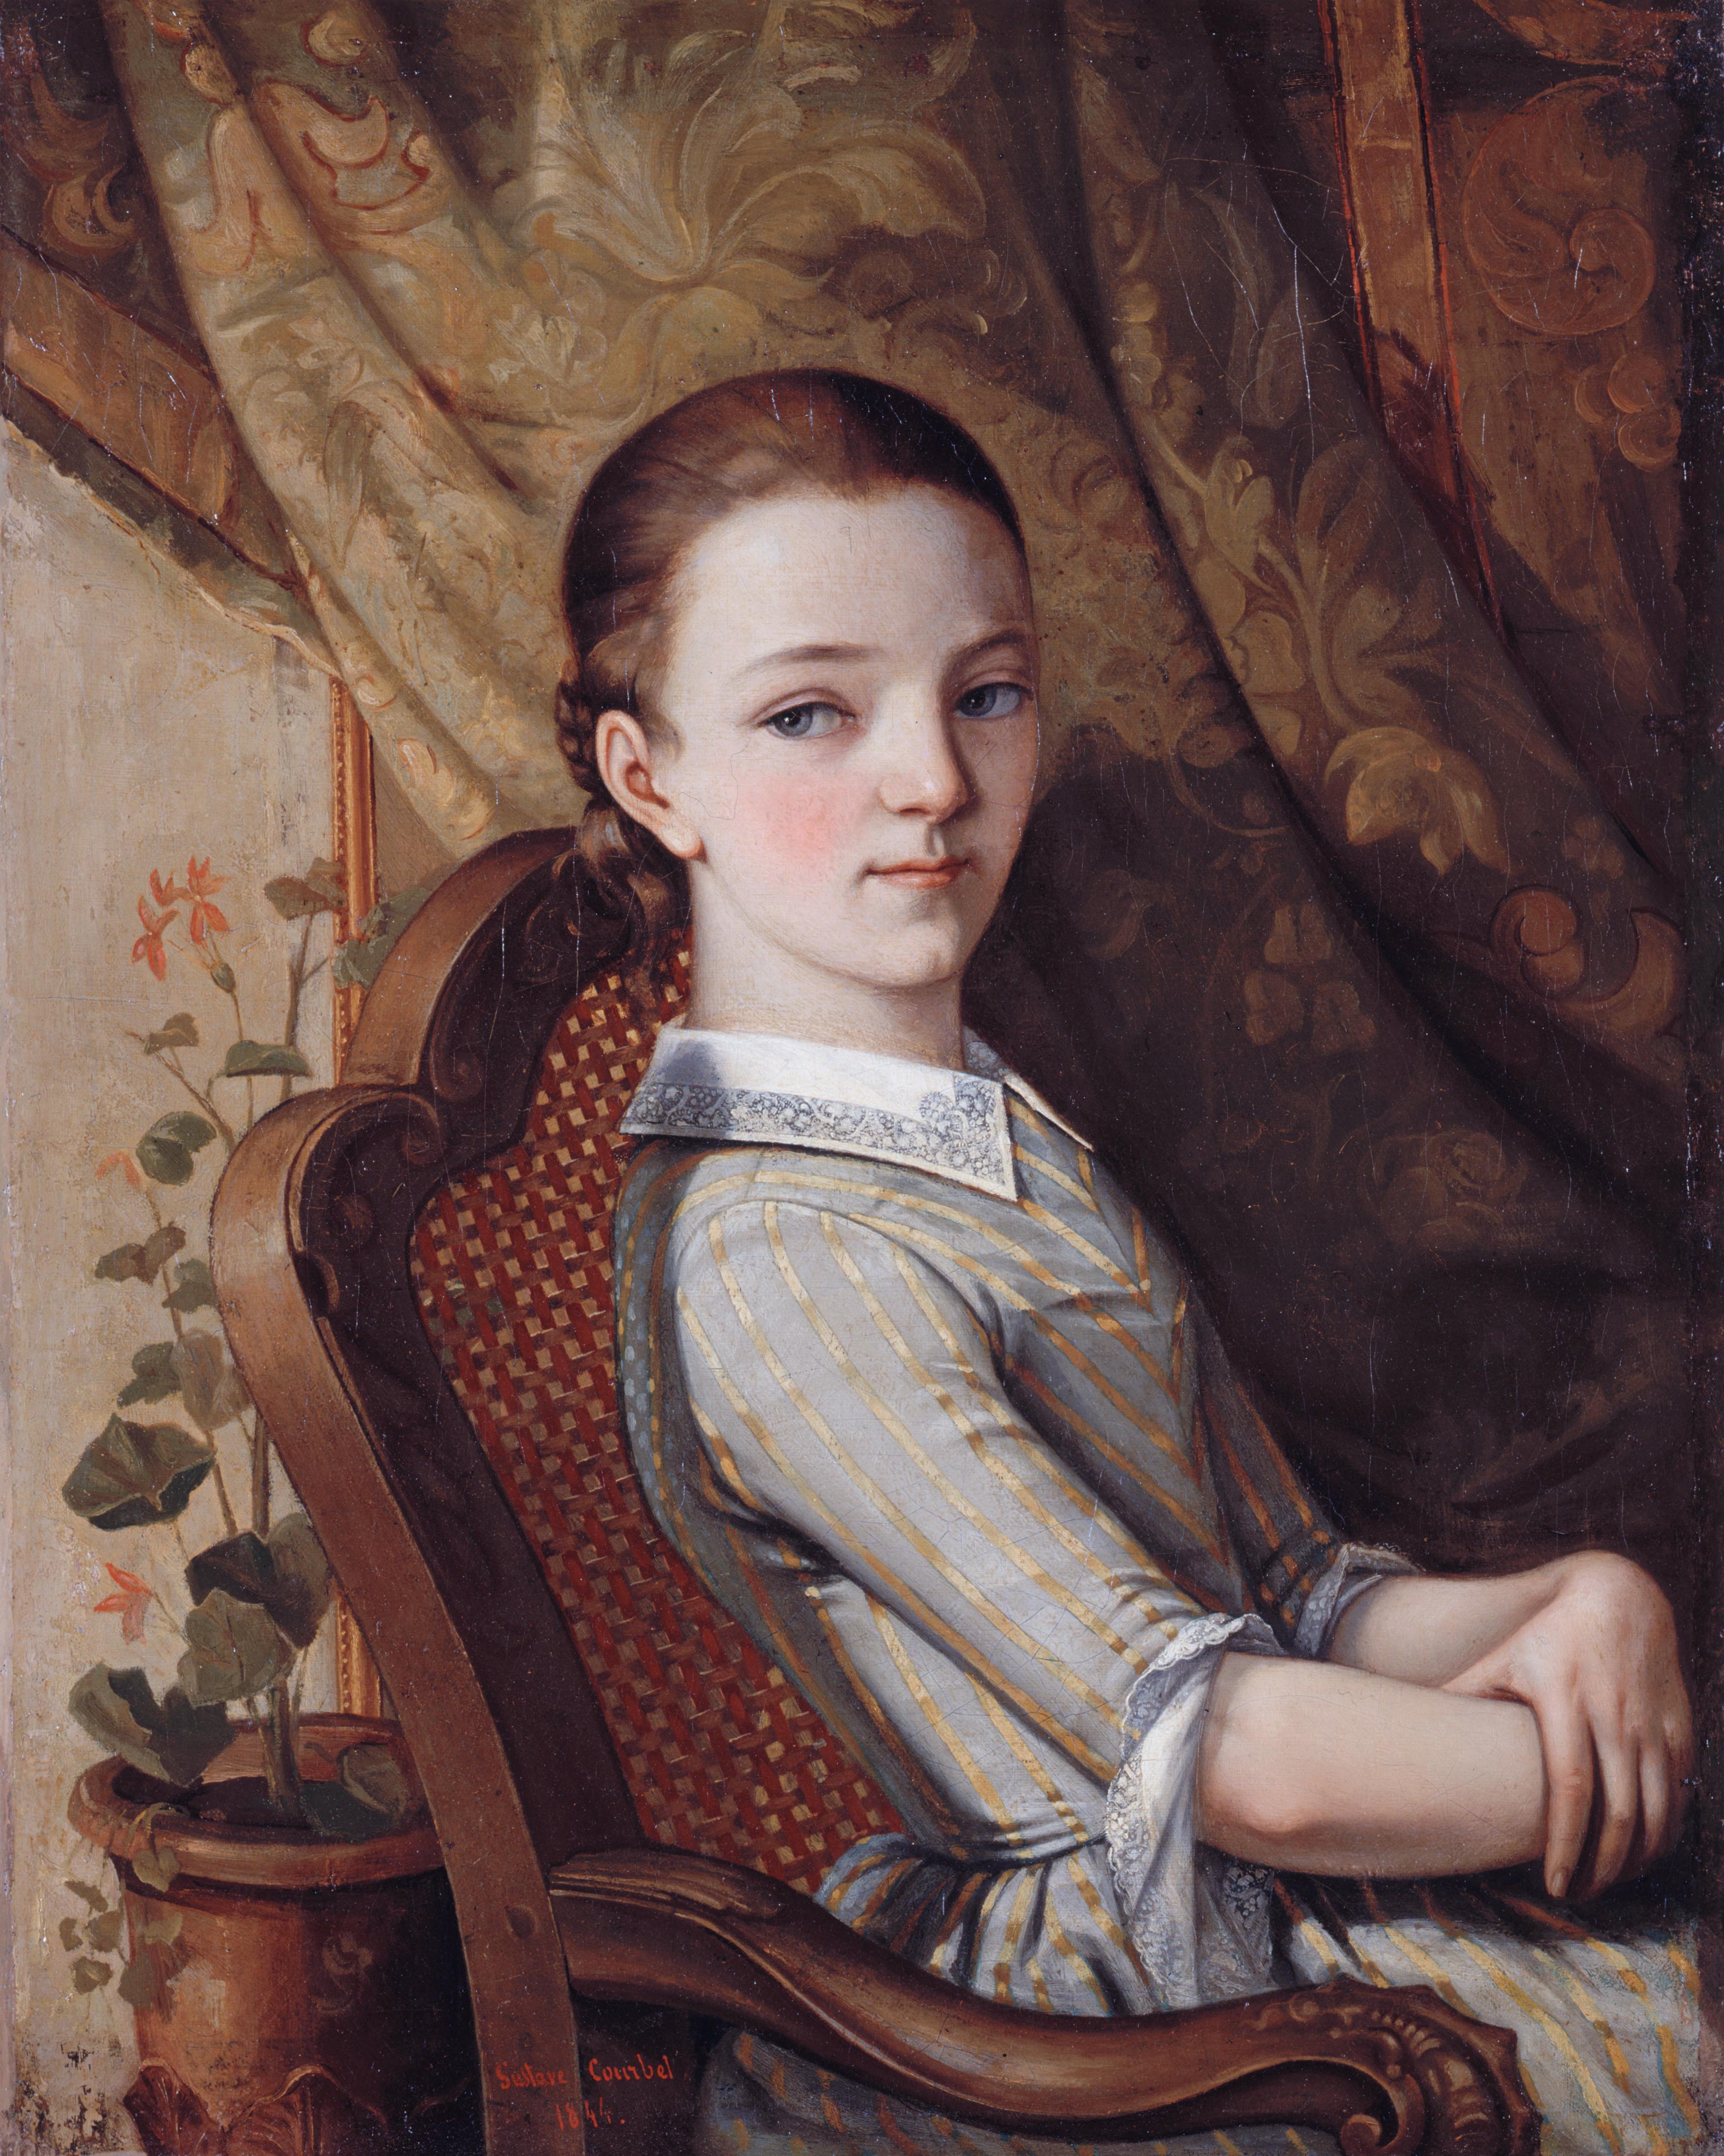 File:Gustave Courbet - Portrait of Juliette Courbet - WGA05481.jpg - Wikimedia Commons